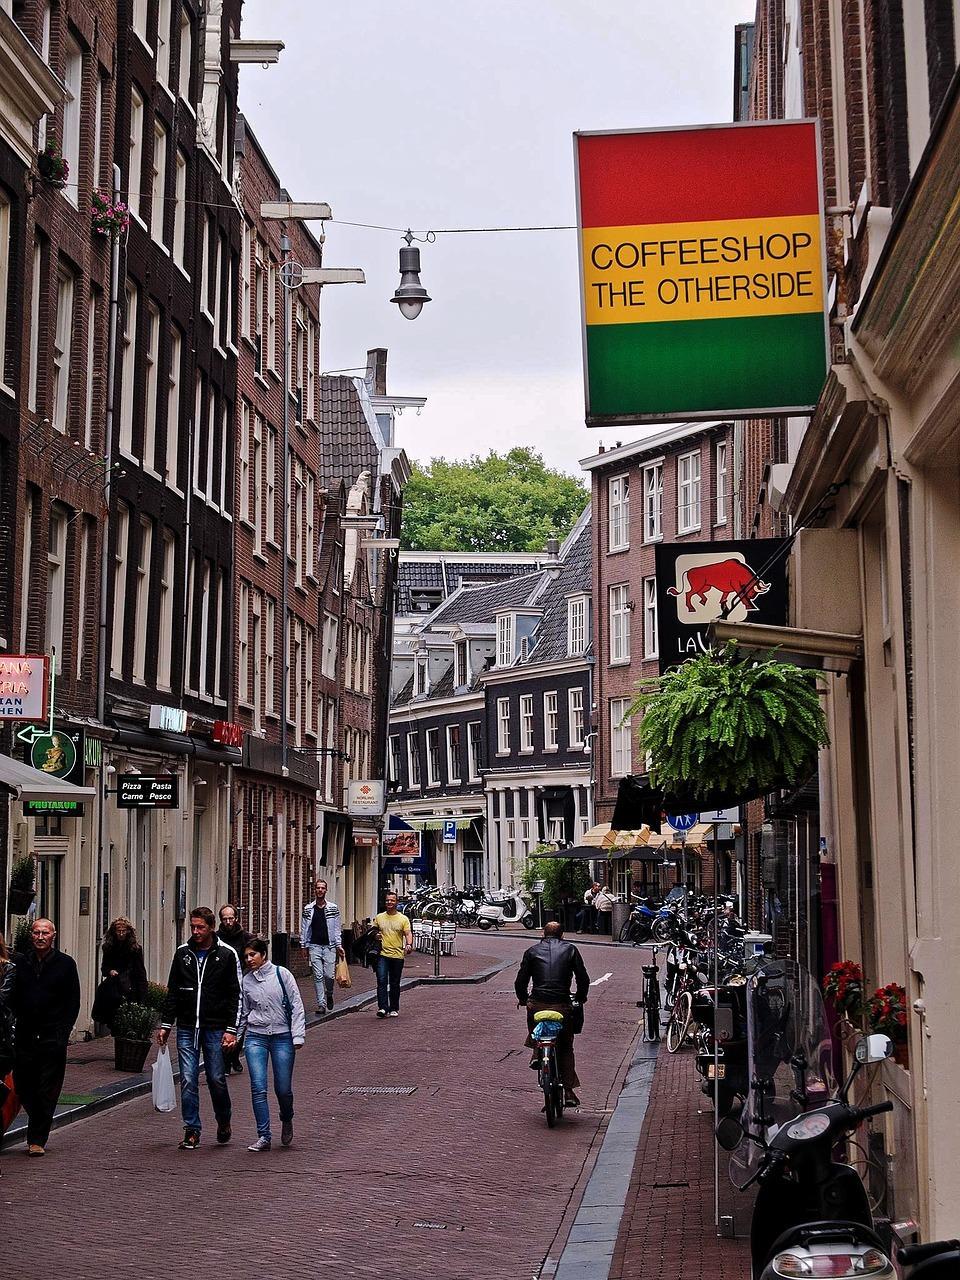 nizozemska konoplja